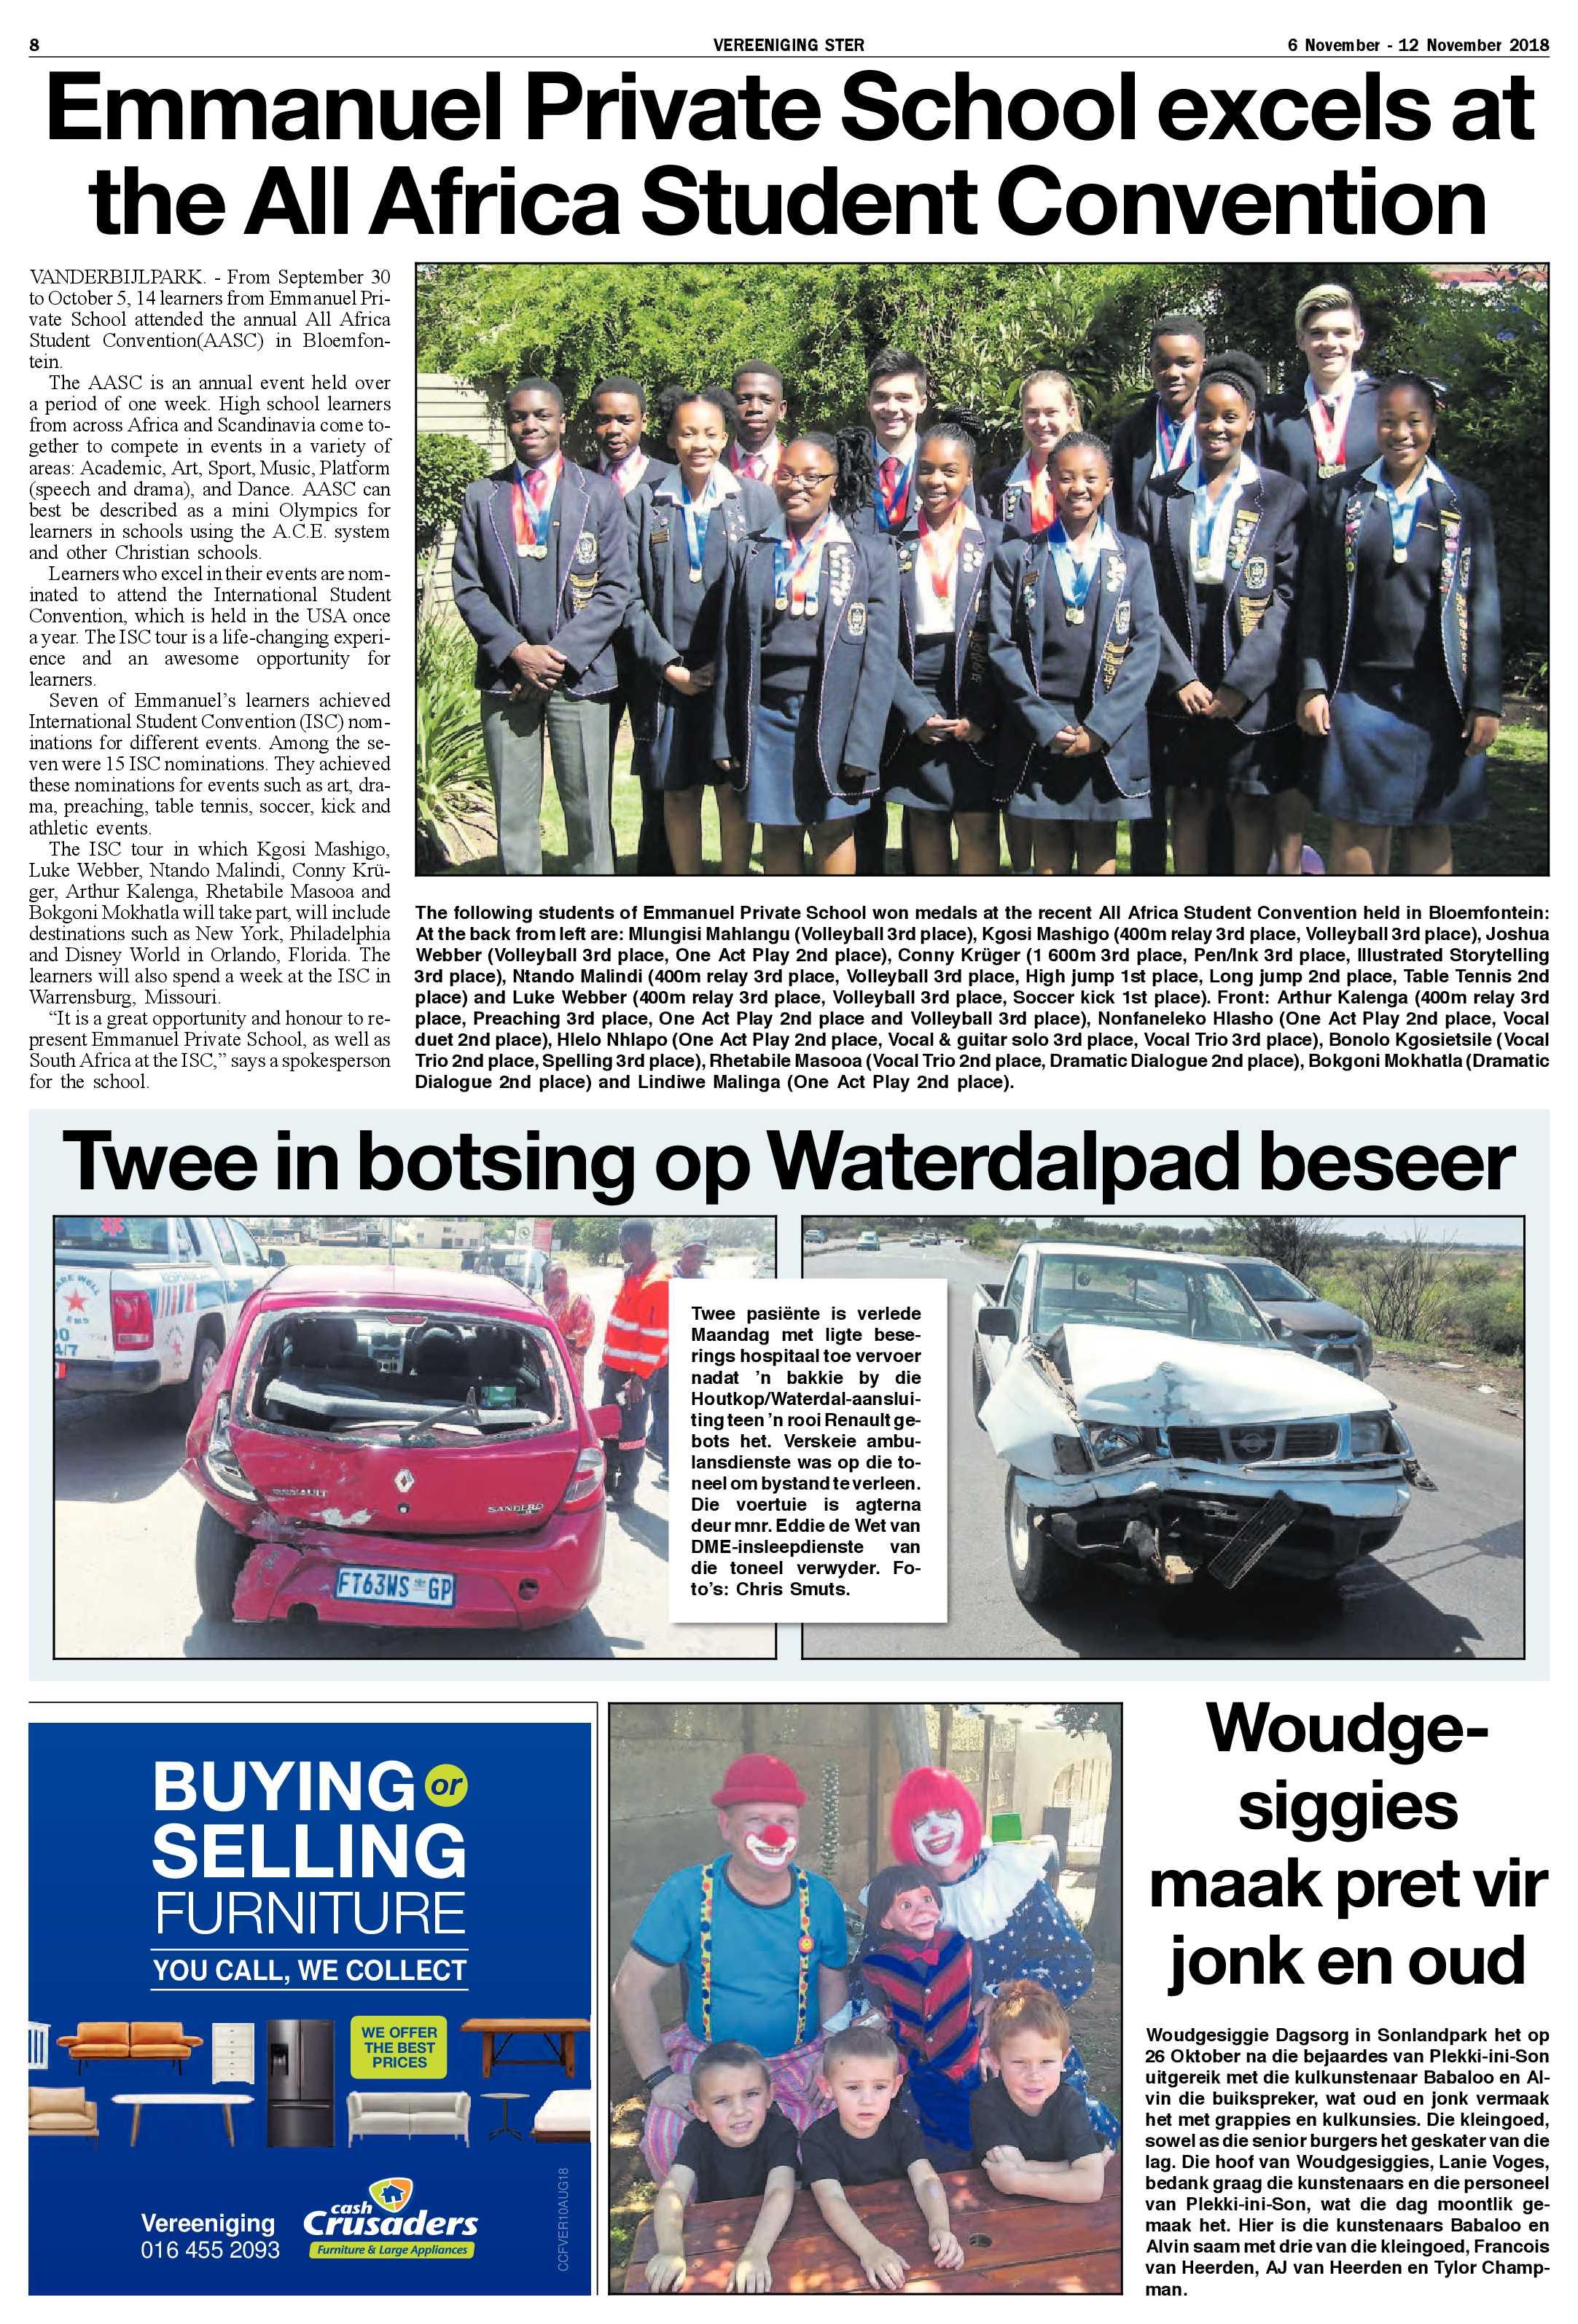 vereeniging-ster-6-12-november-2018-epapers-page-8